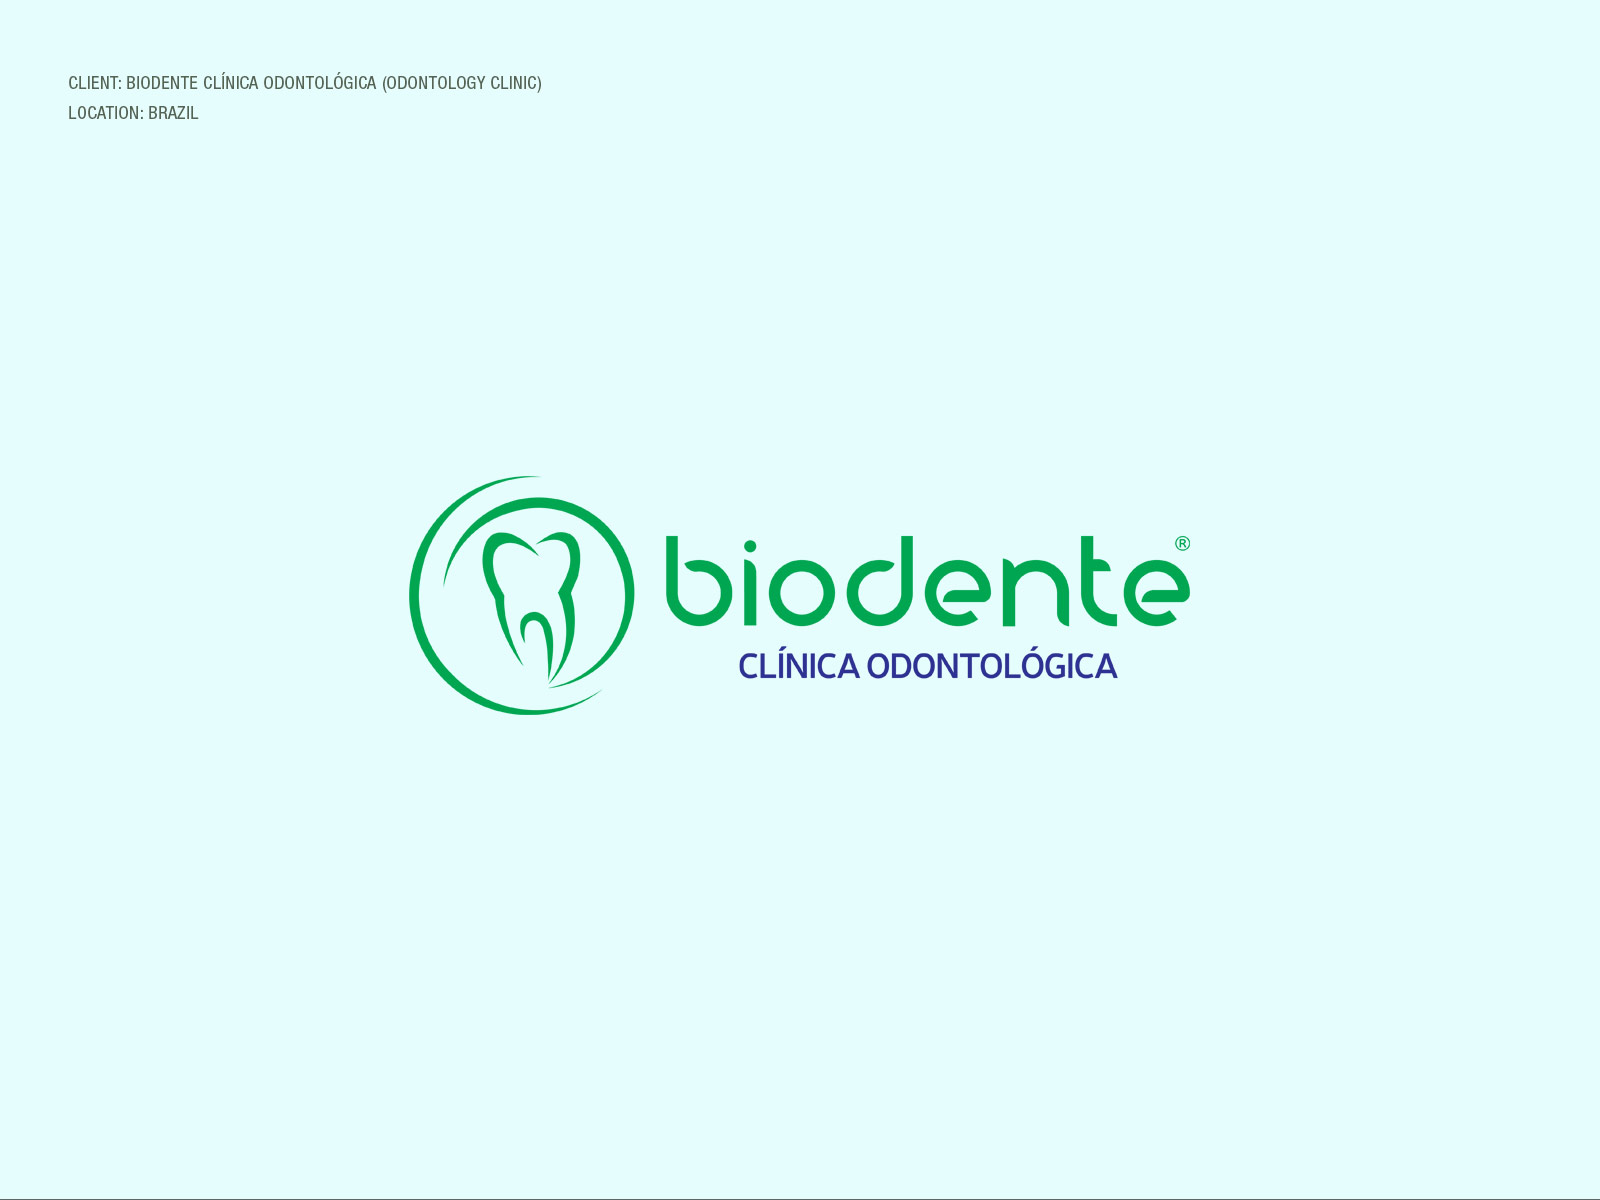 logodesign-biodente